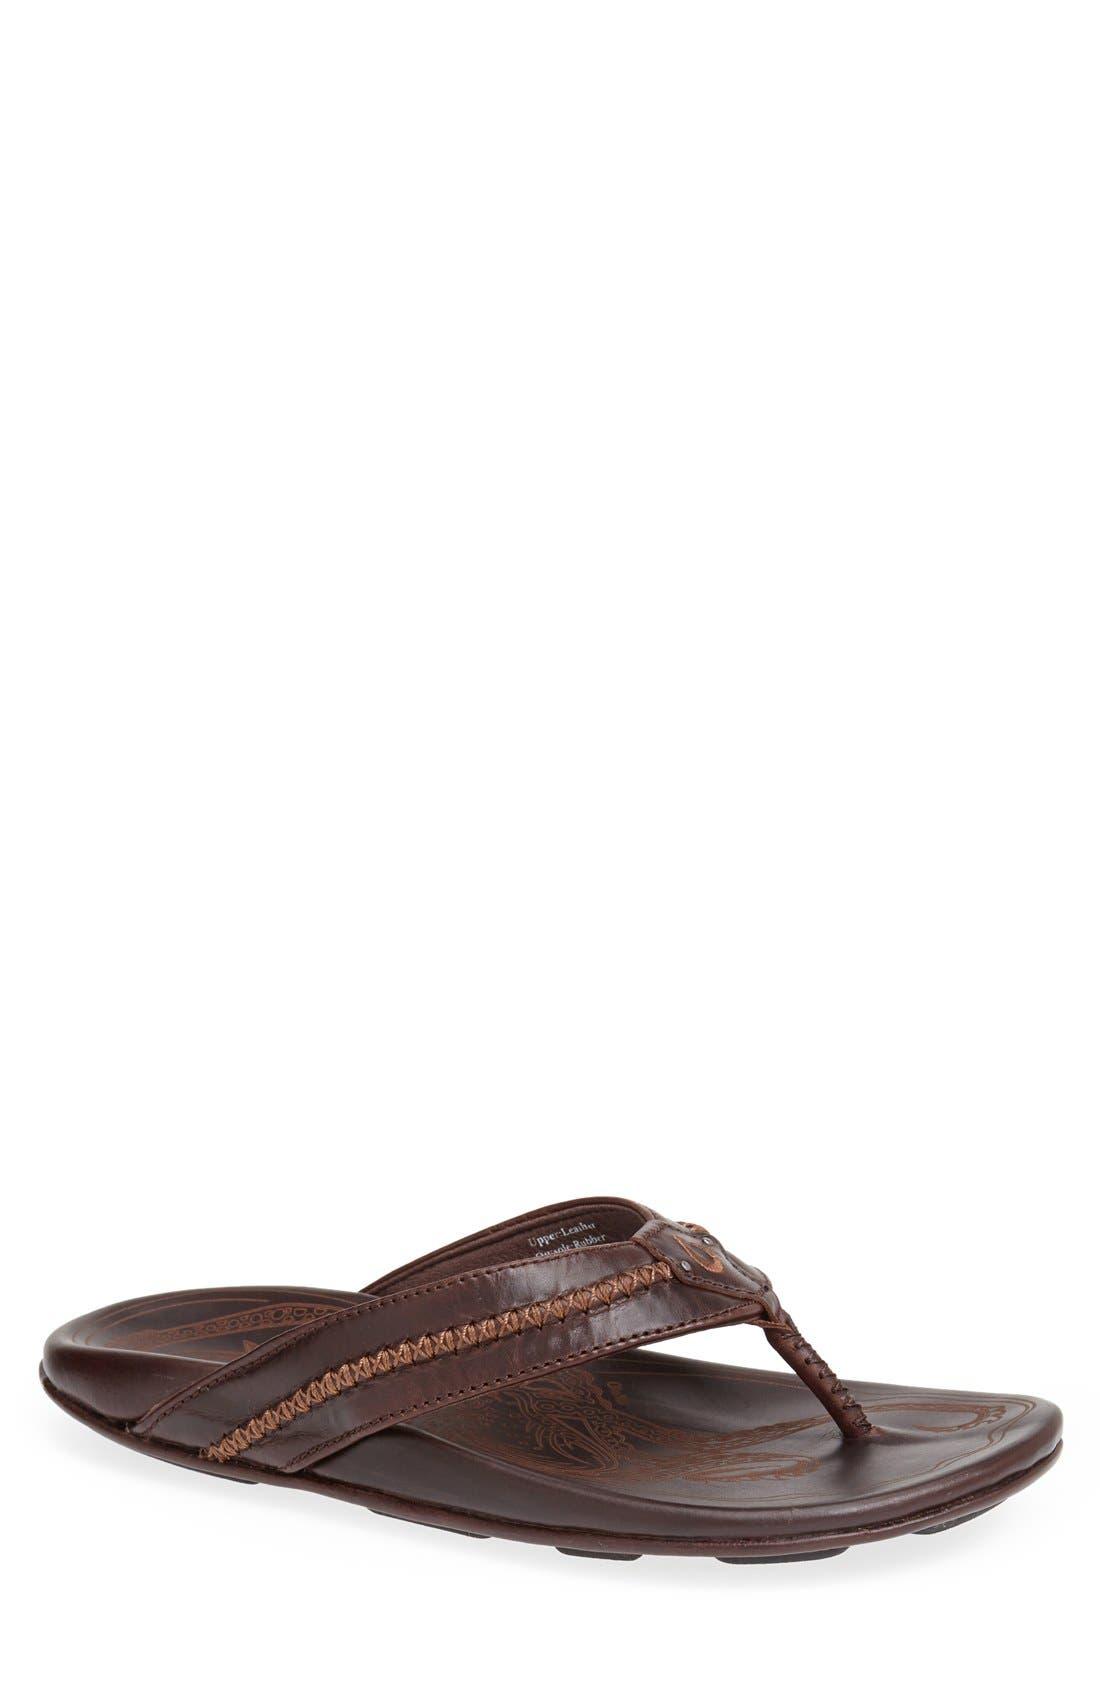 Mea Ola Flip Flop,                         Main,                         color, Dark Java/ Dark Java Leather